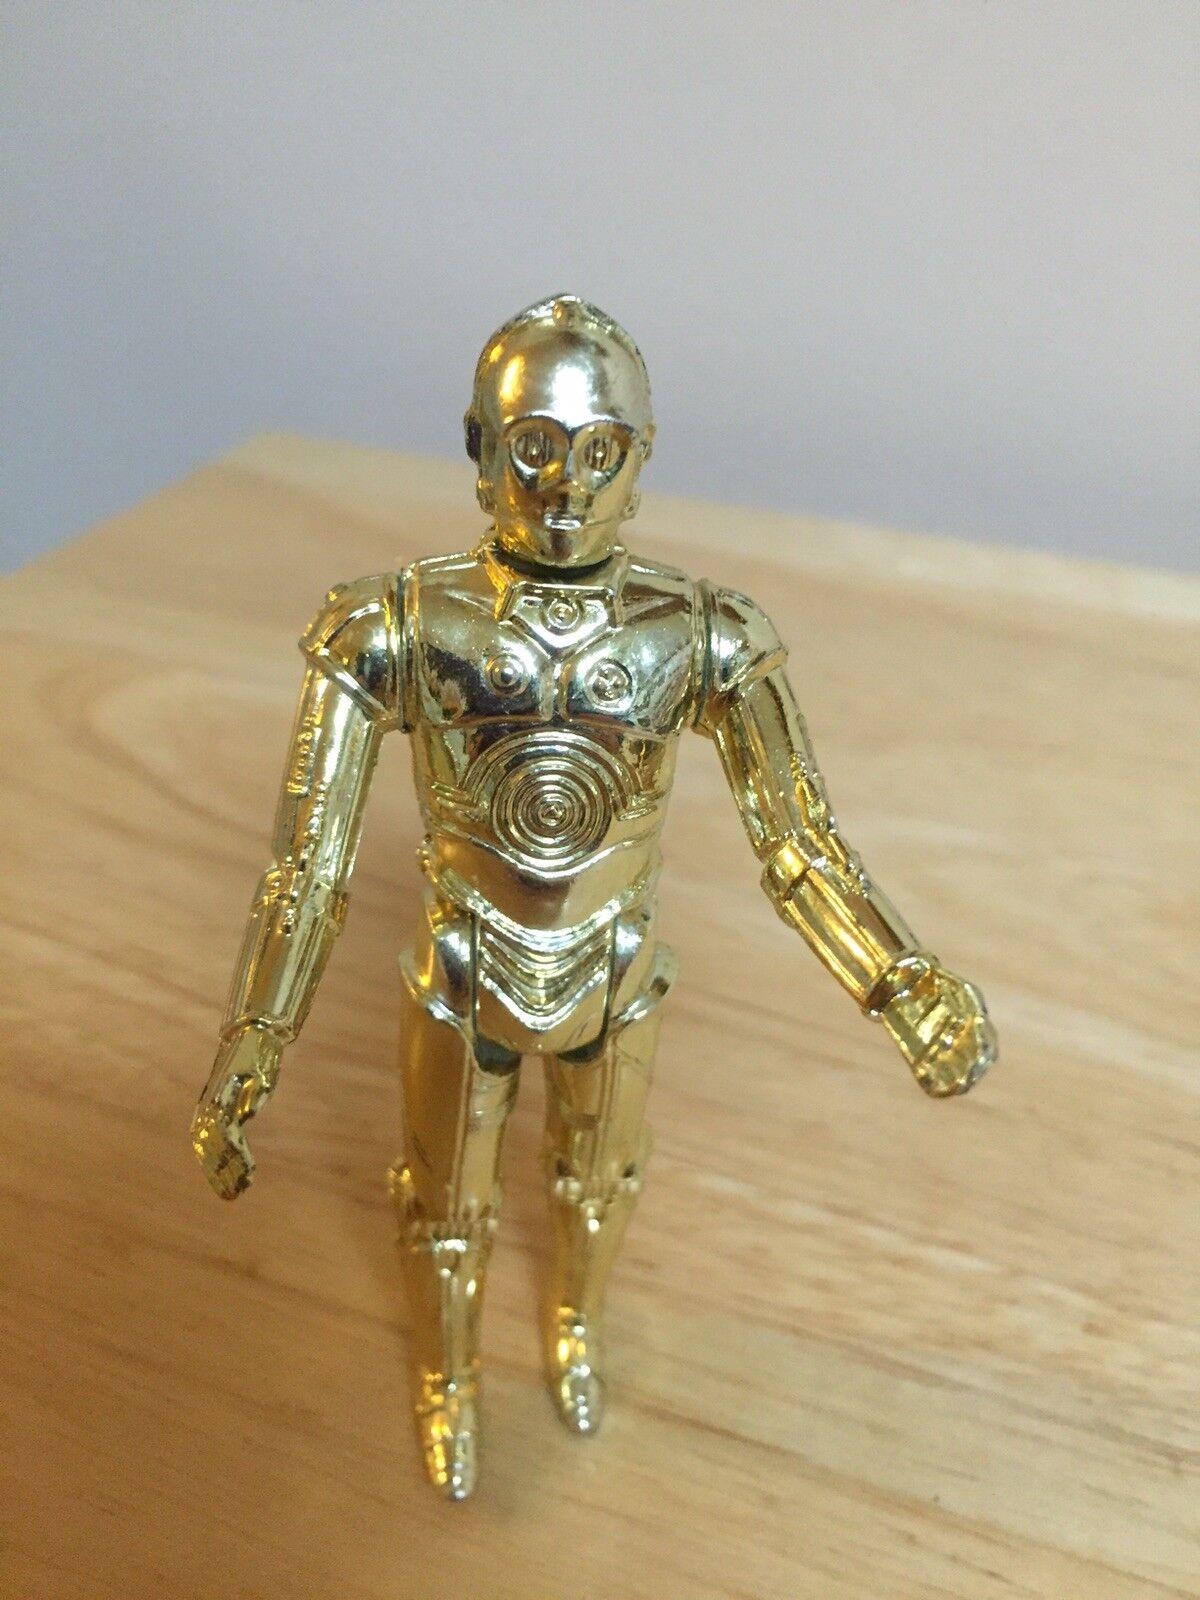 1977 Star Wars Action Figure C-3PO Vintage